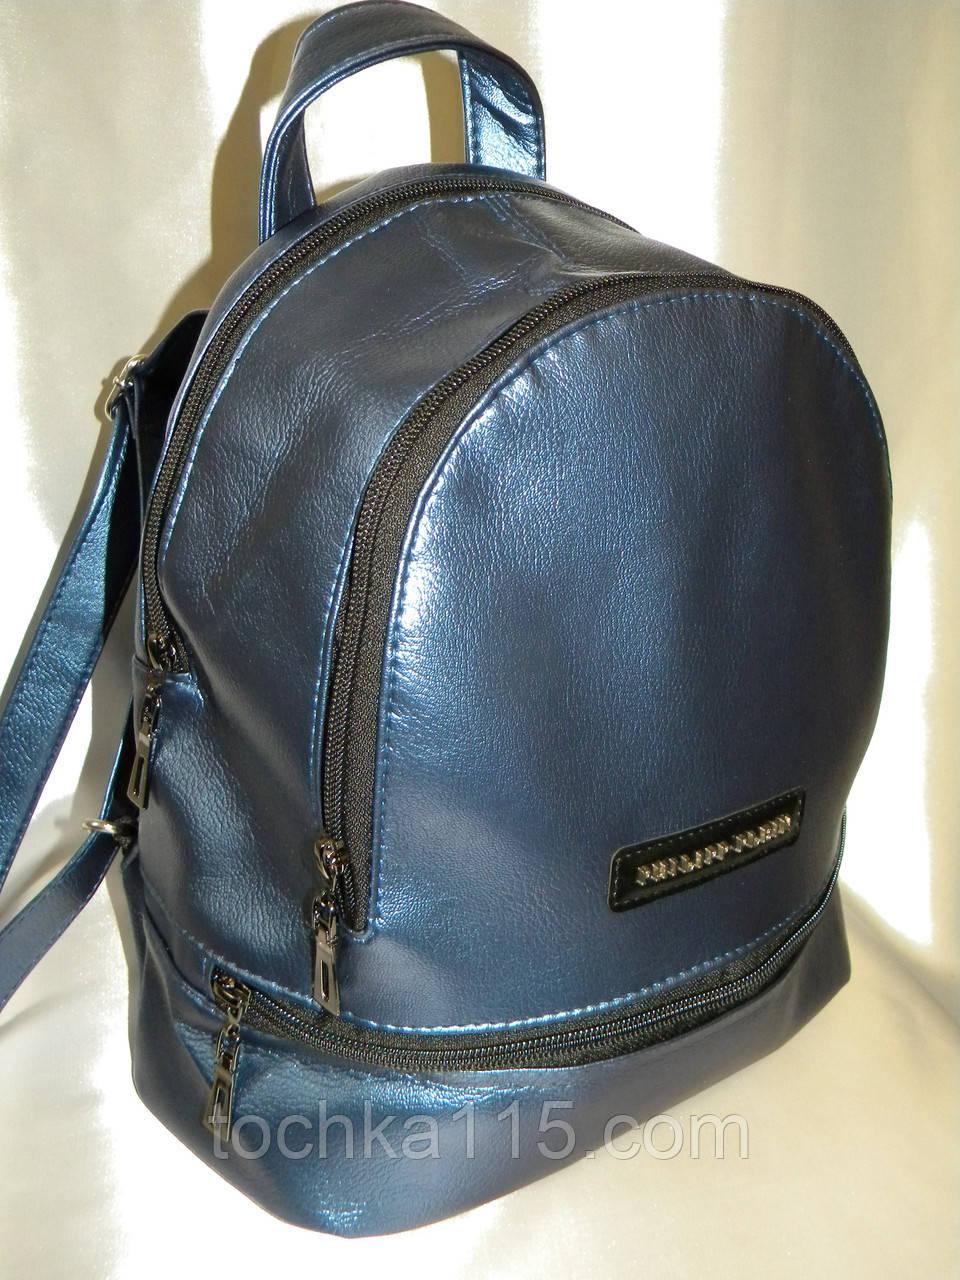 Рюкзак для девочек Philipp Plein синий реплика, фото 1